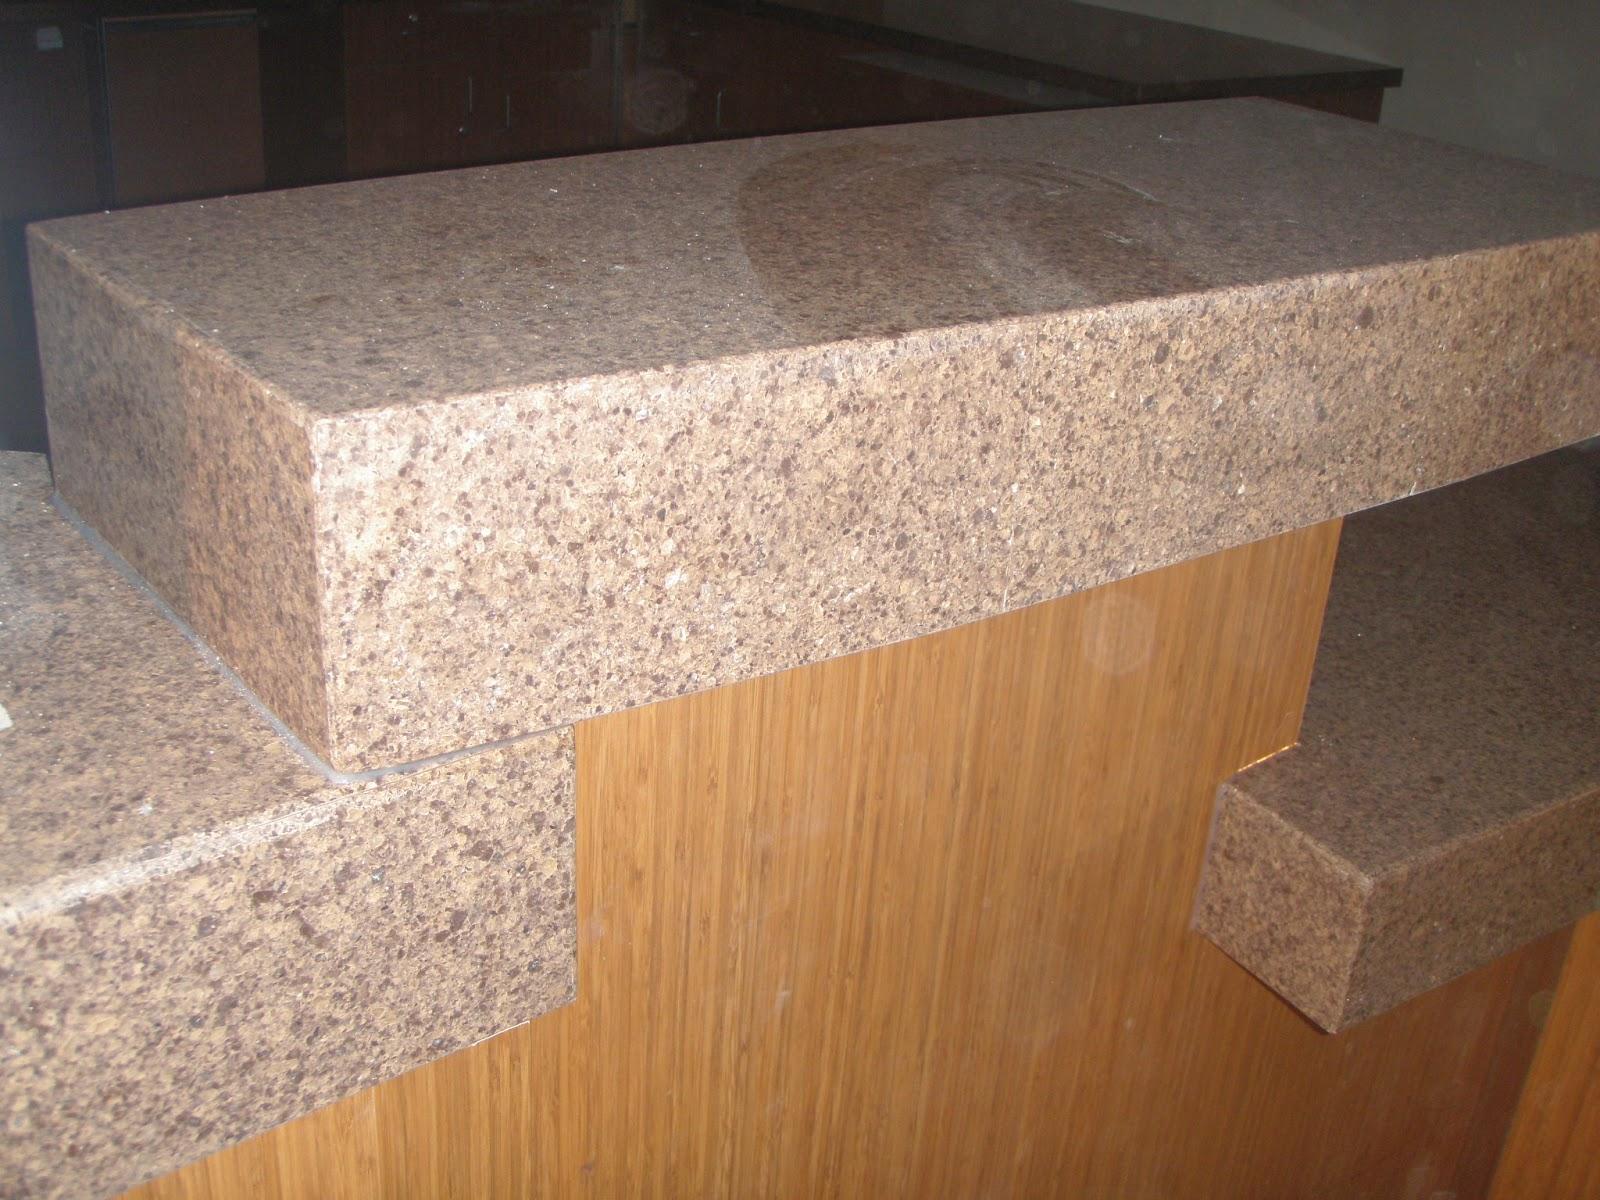 stone solutions granite quartz vs granite. Black Bedroom Furniture Sets. Home Design Ideas